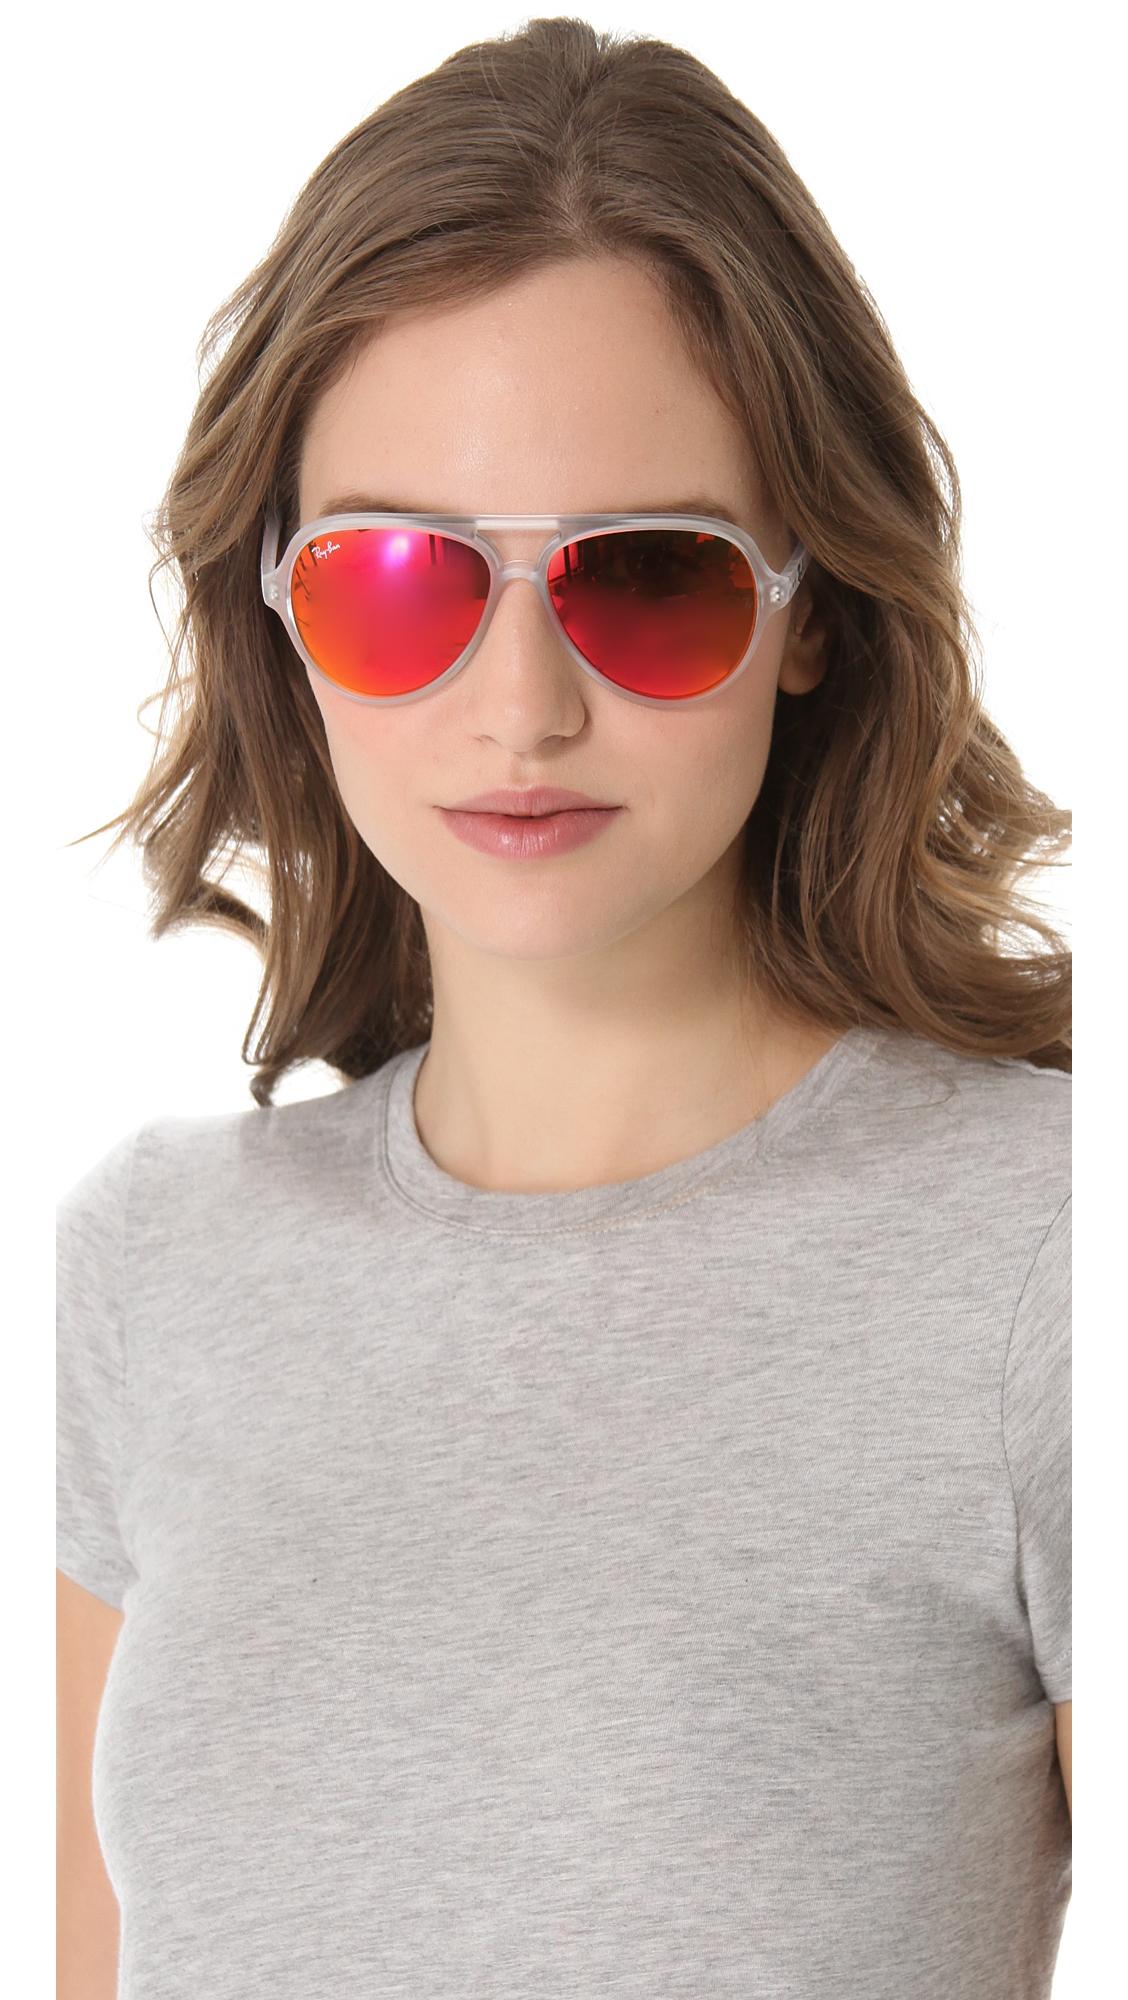 Ray-ban Mirrored Cats Aviator Sunglasses | Lyst